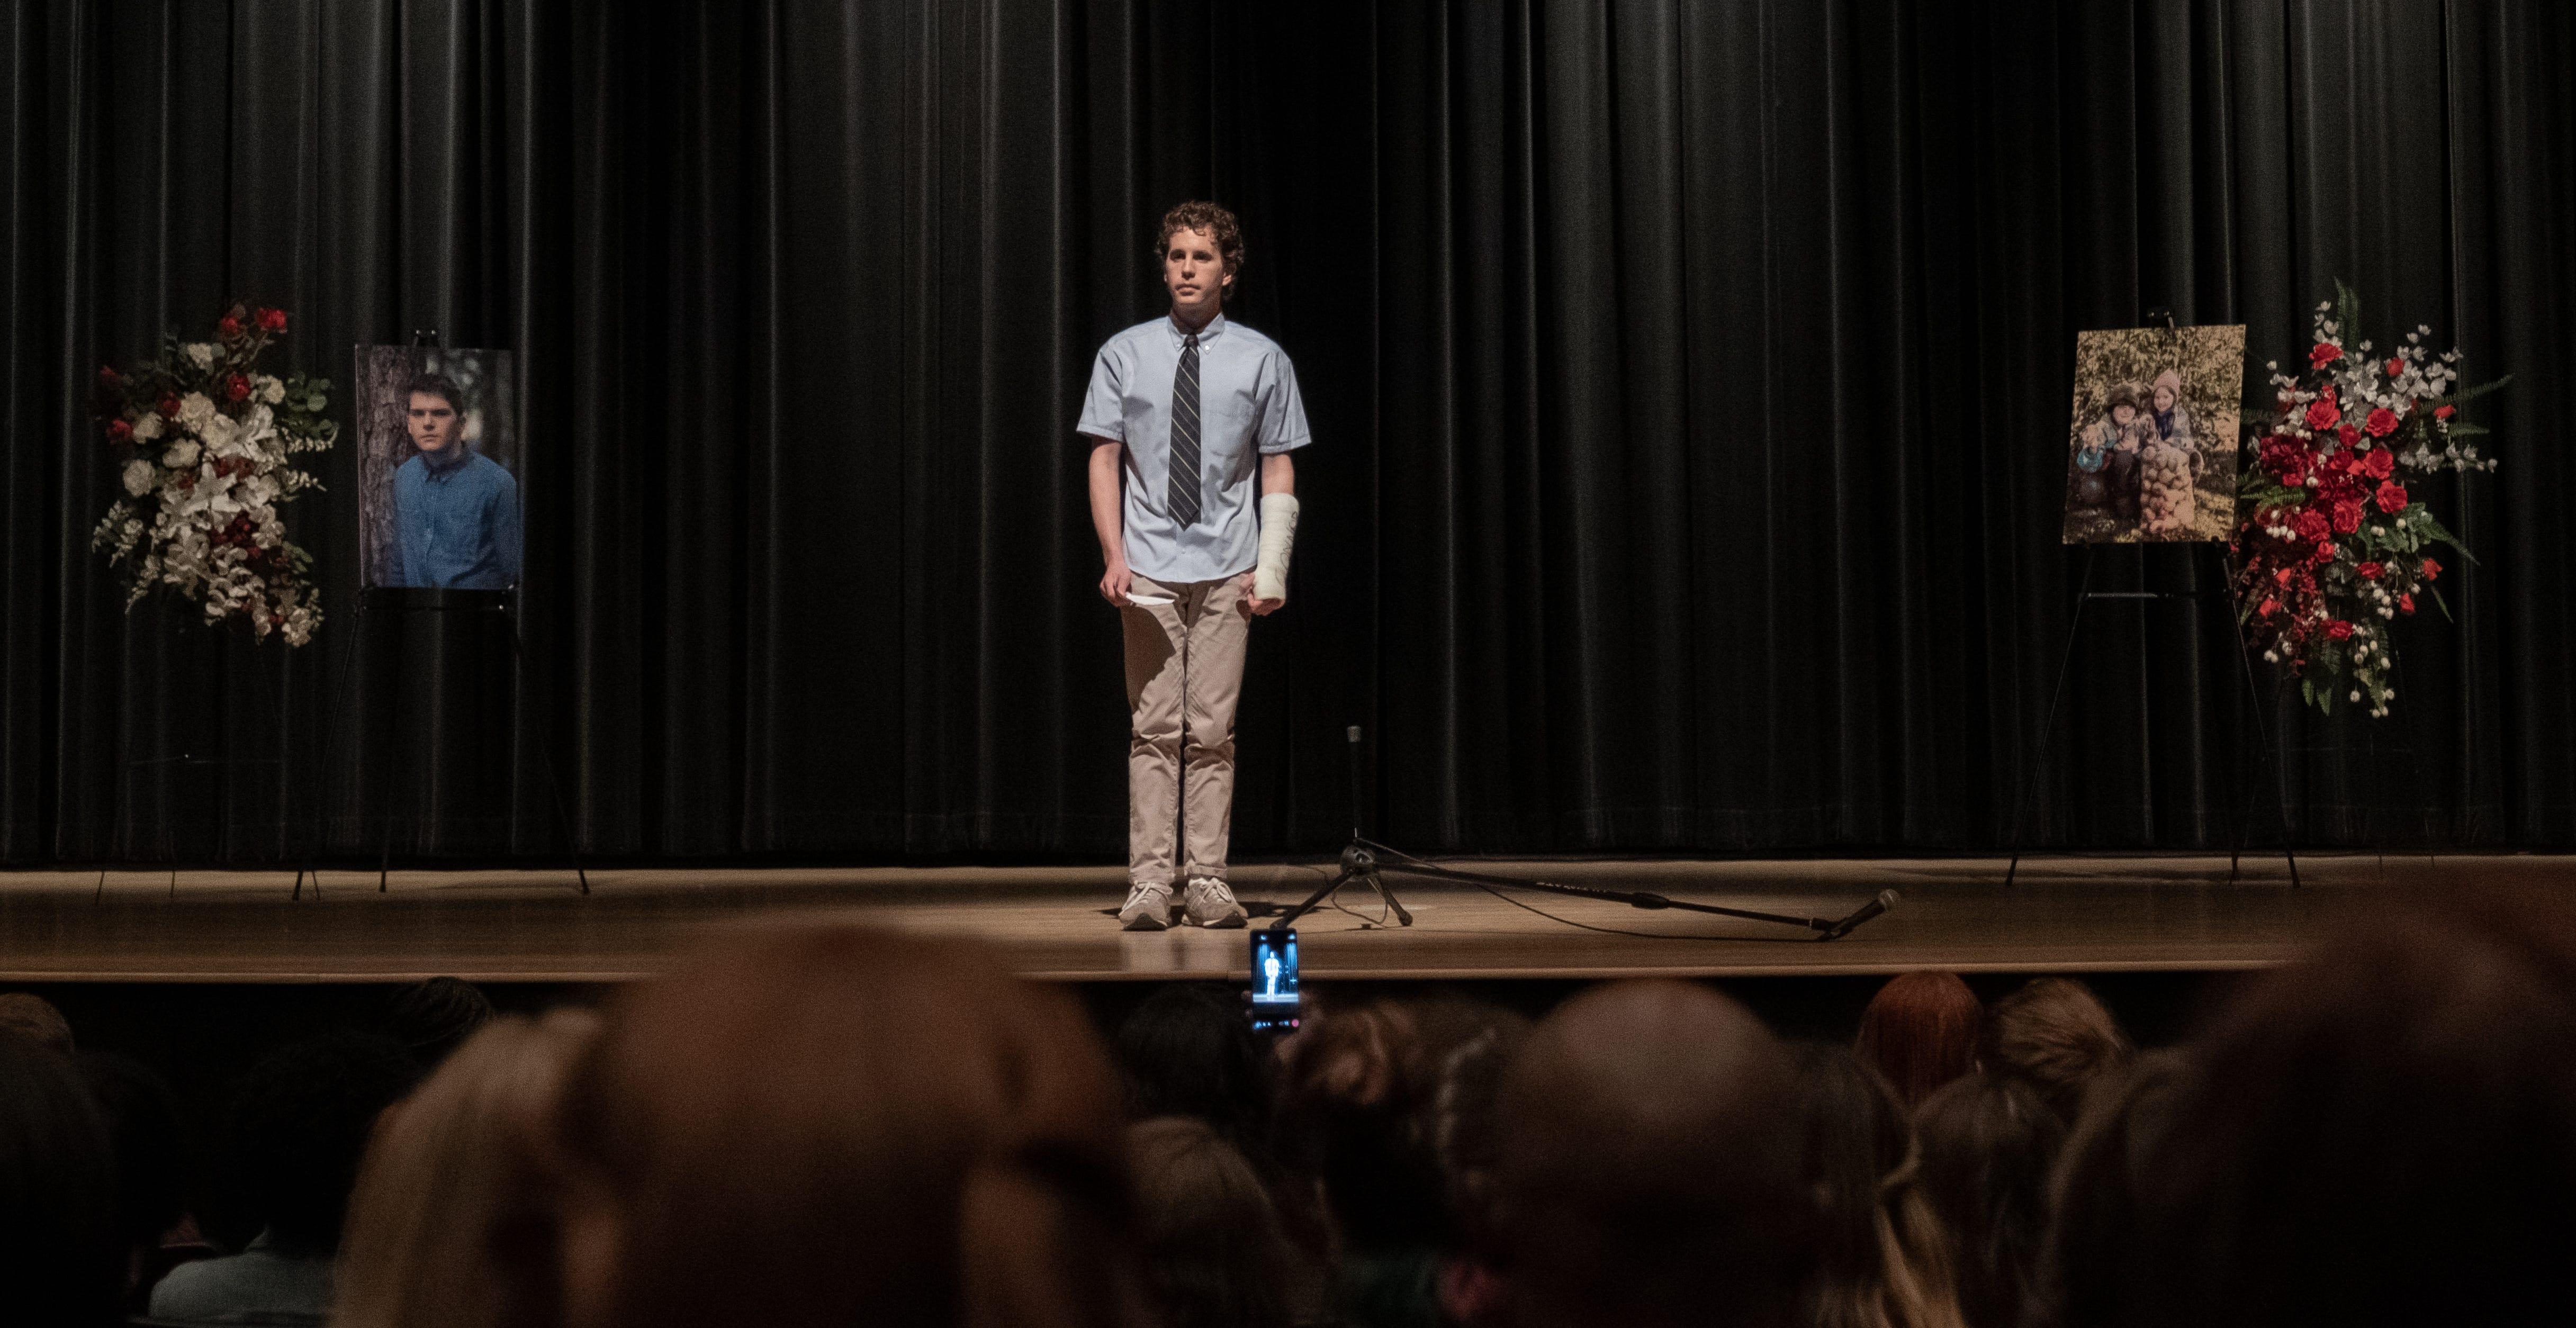 Watch Ben Platt reprise his role as Evan Hansen in  Dear Evan Hansen  trailer